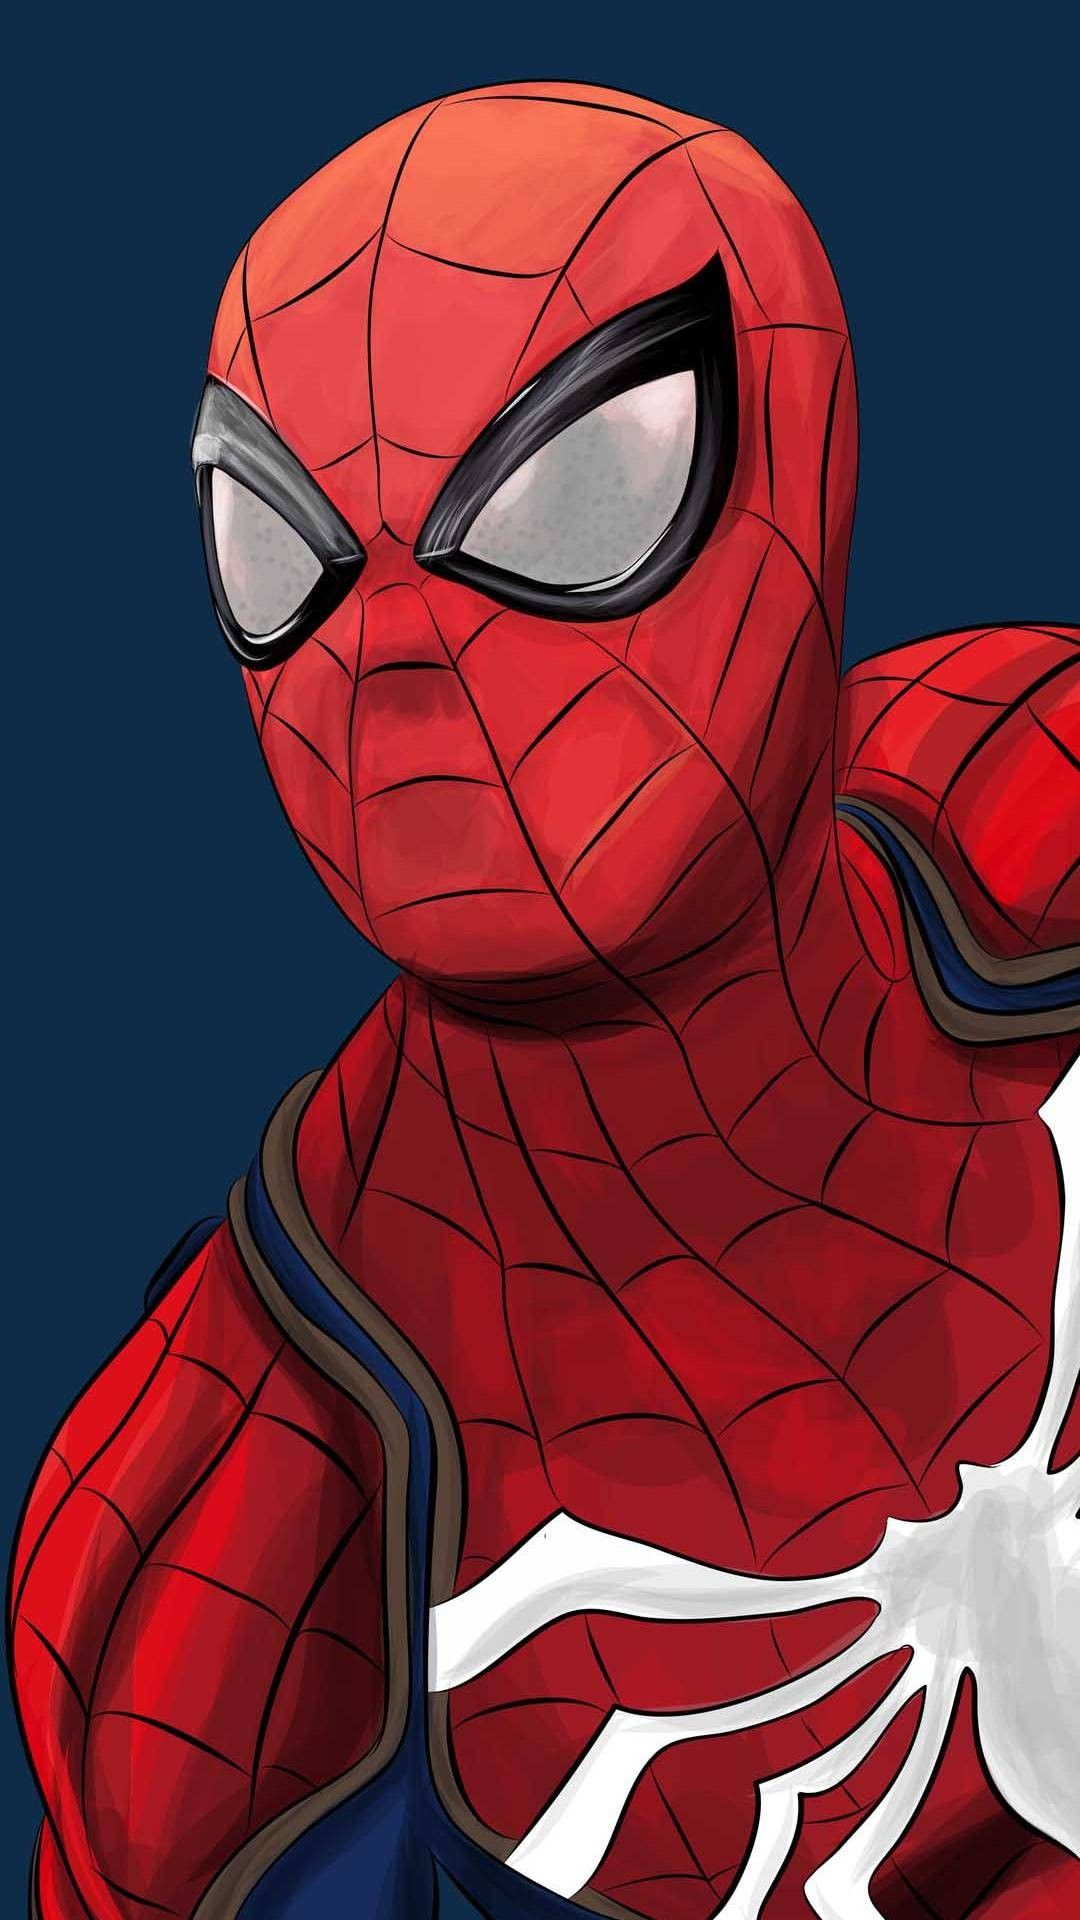 Wallpapers | Spiderman, Spiderman art, Superhero wallpaper